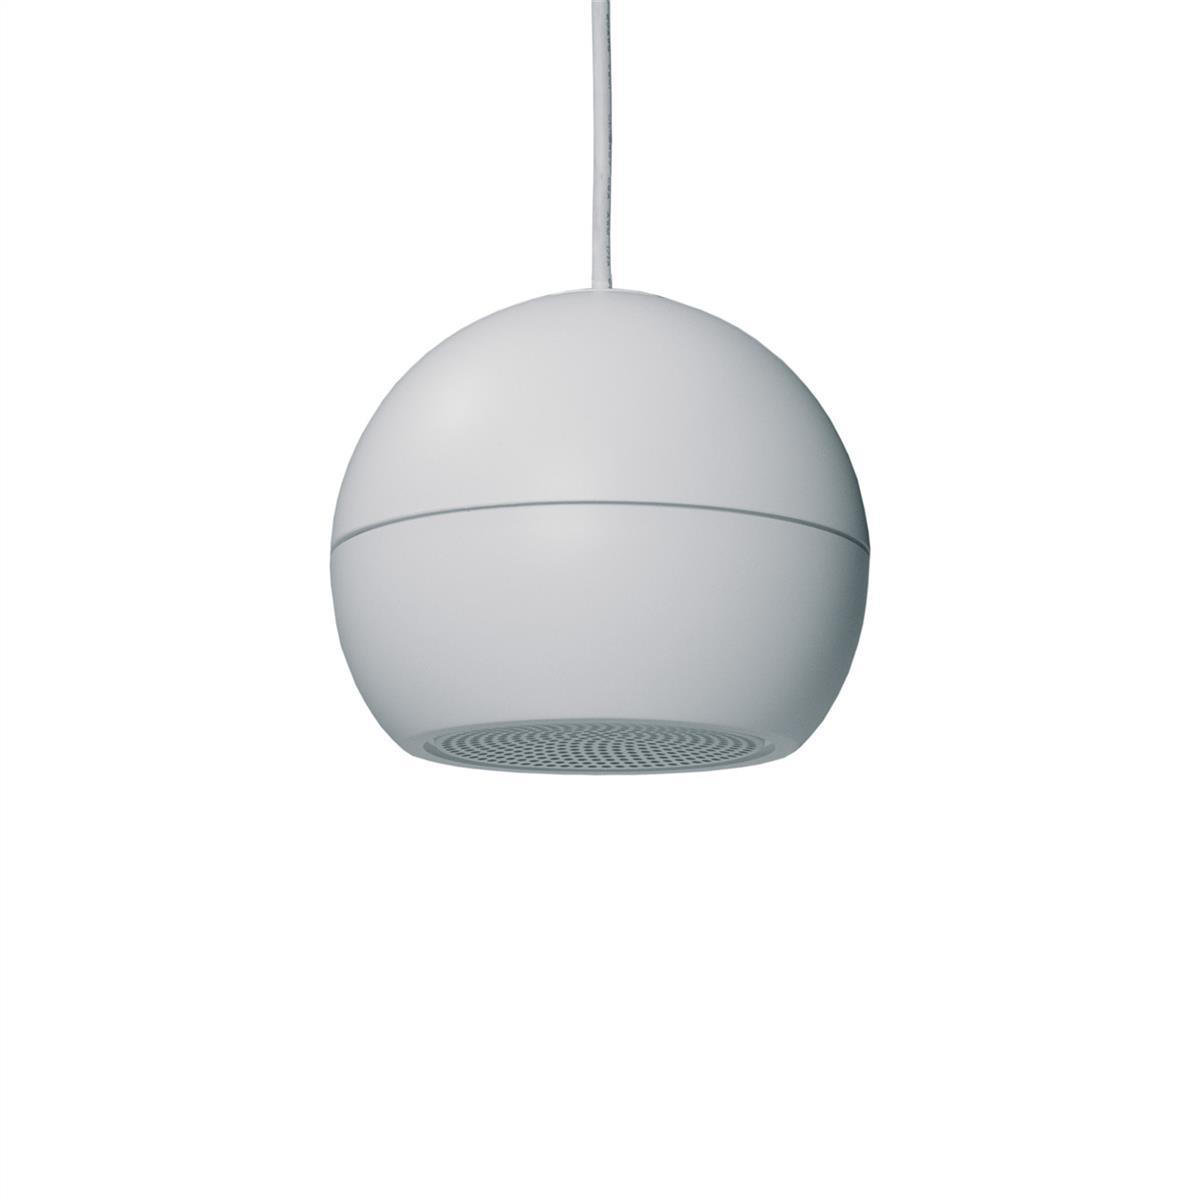 Apart Two-way pendant sphere speaker, 100 volt / 16 watts